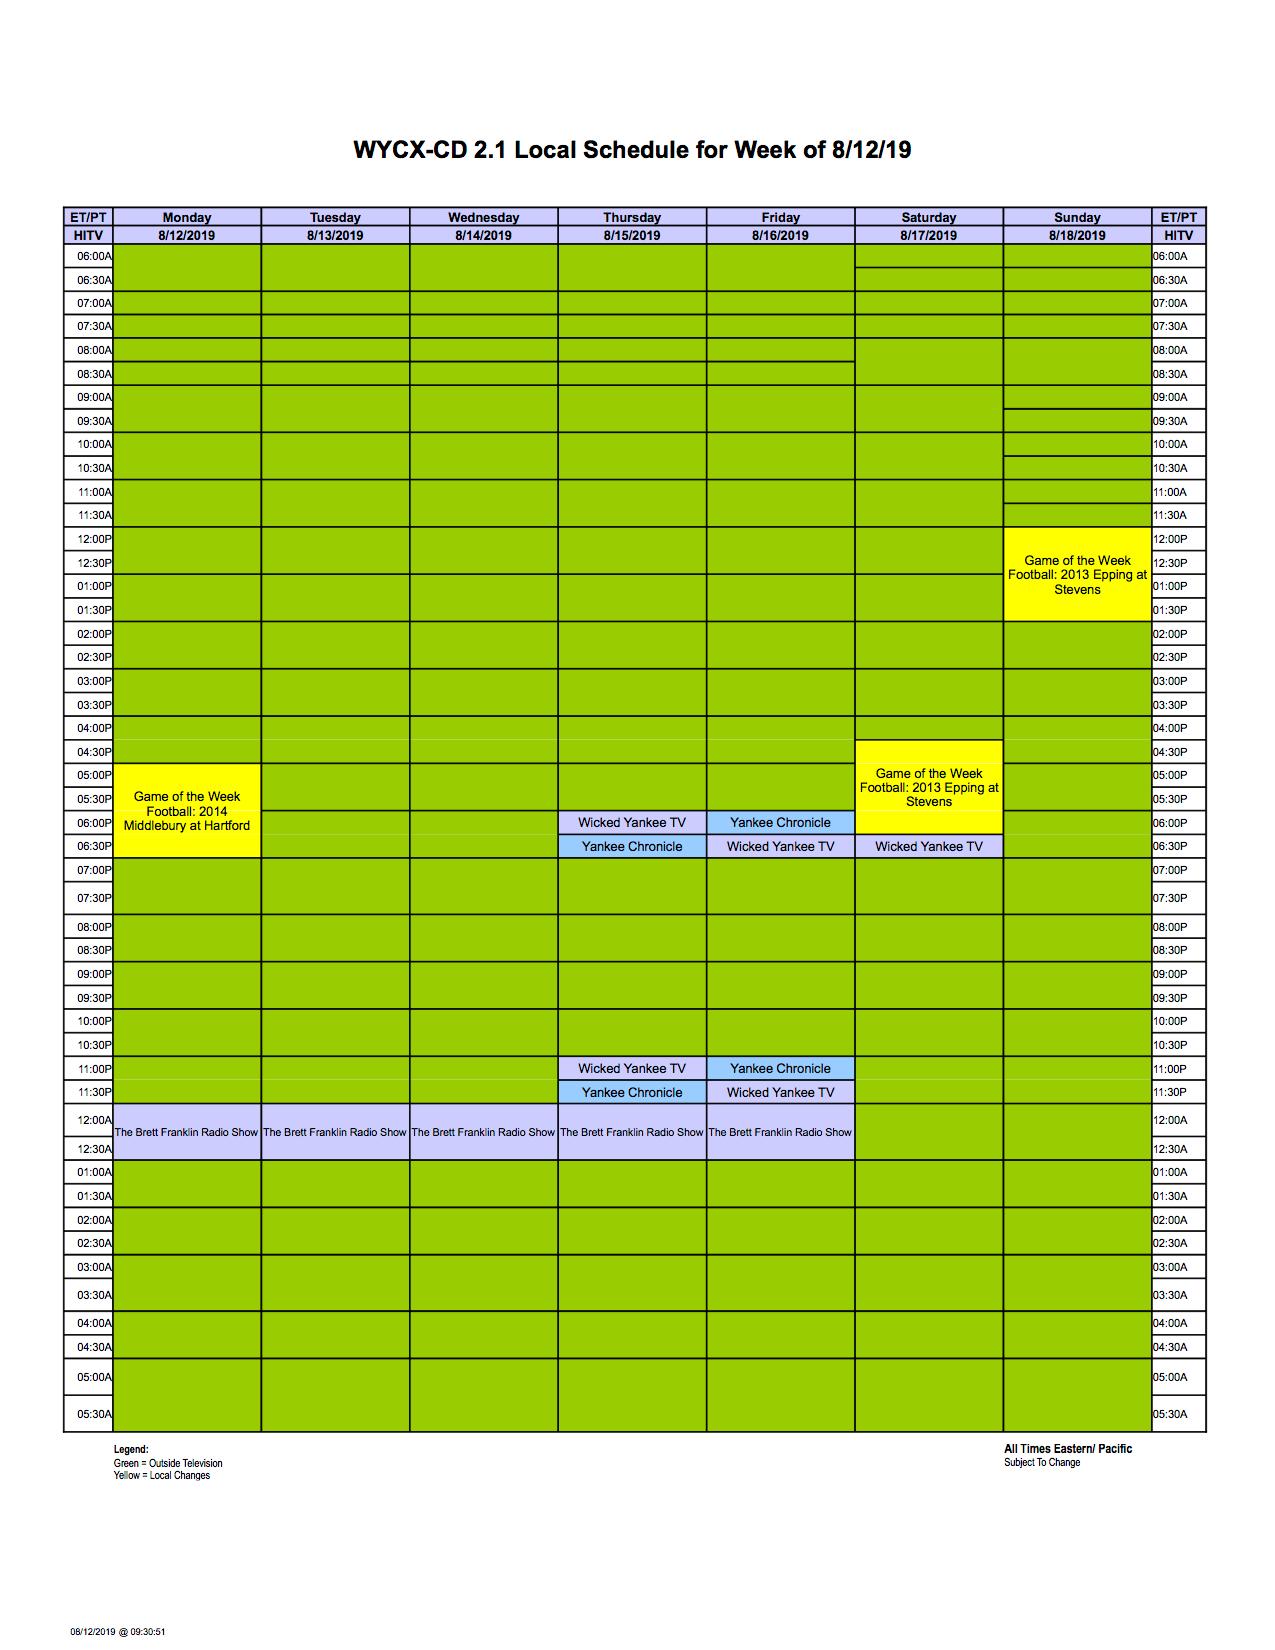 wycx_otv-local-08.12.19